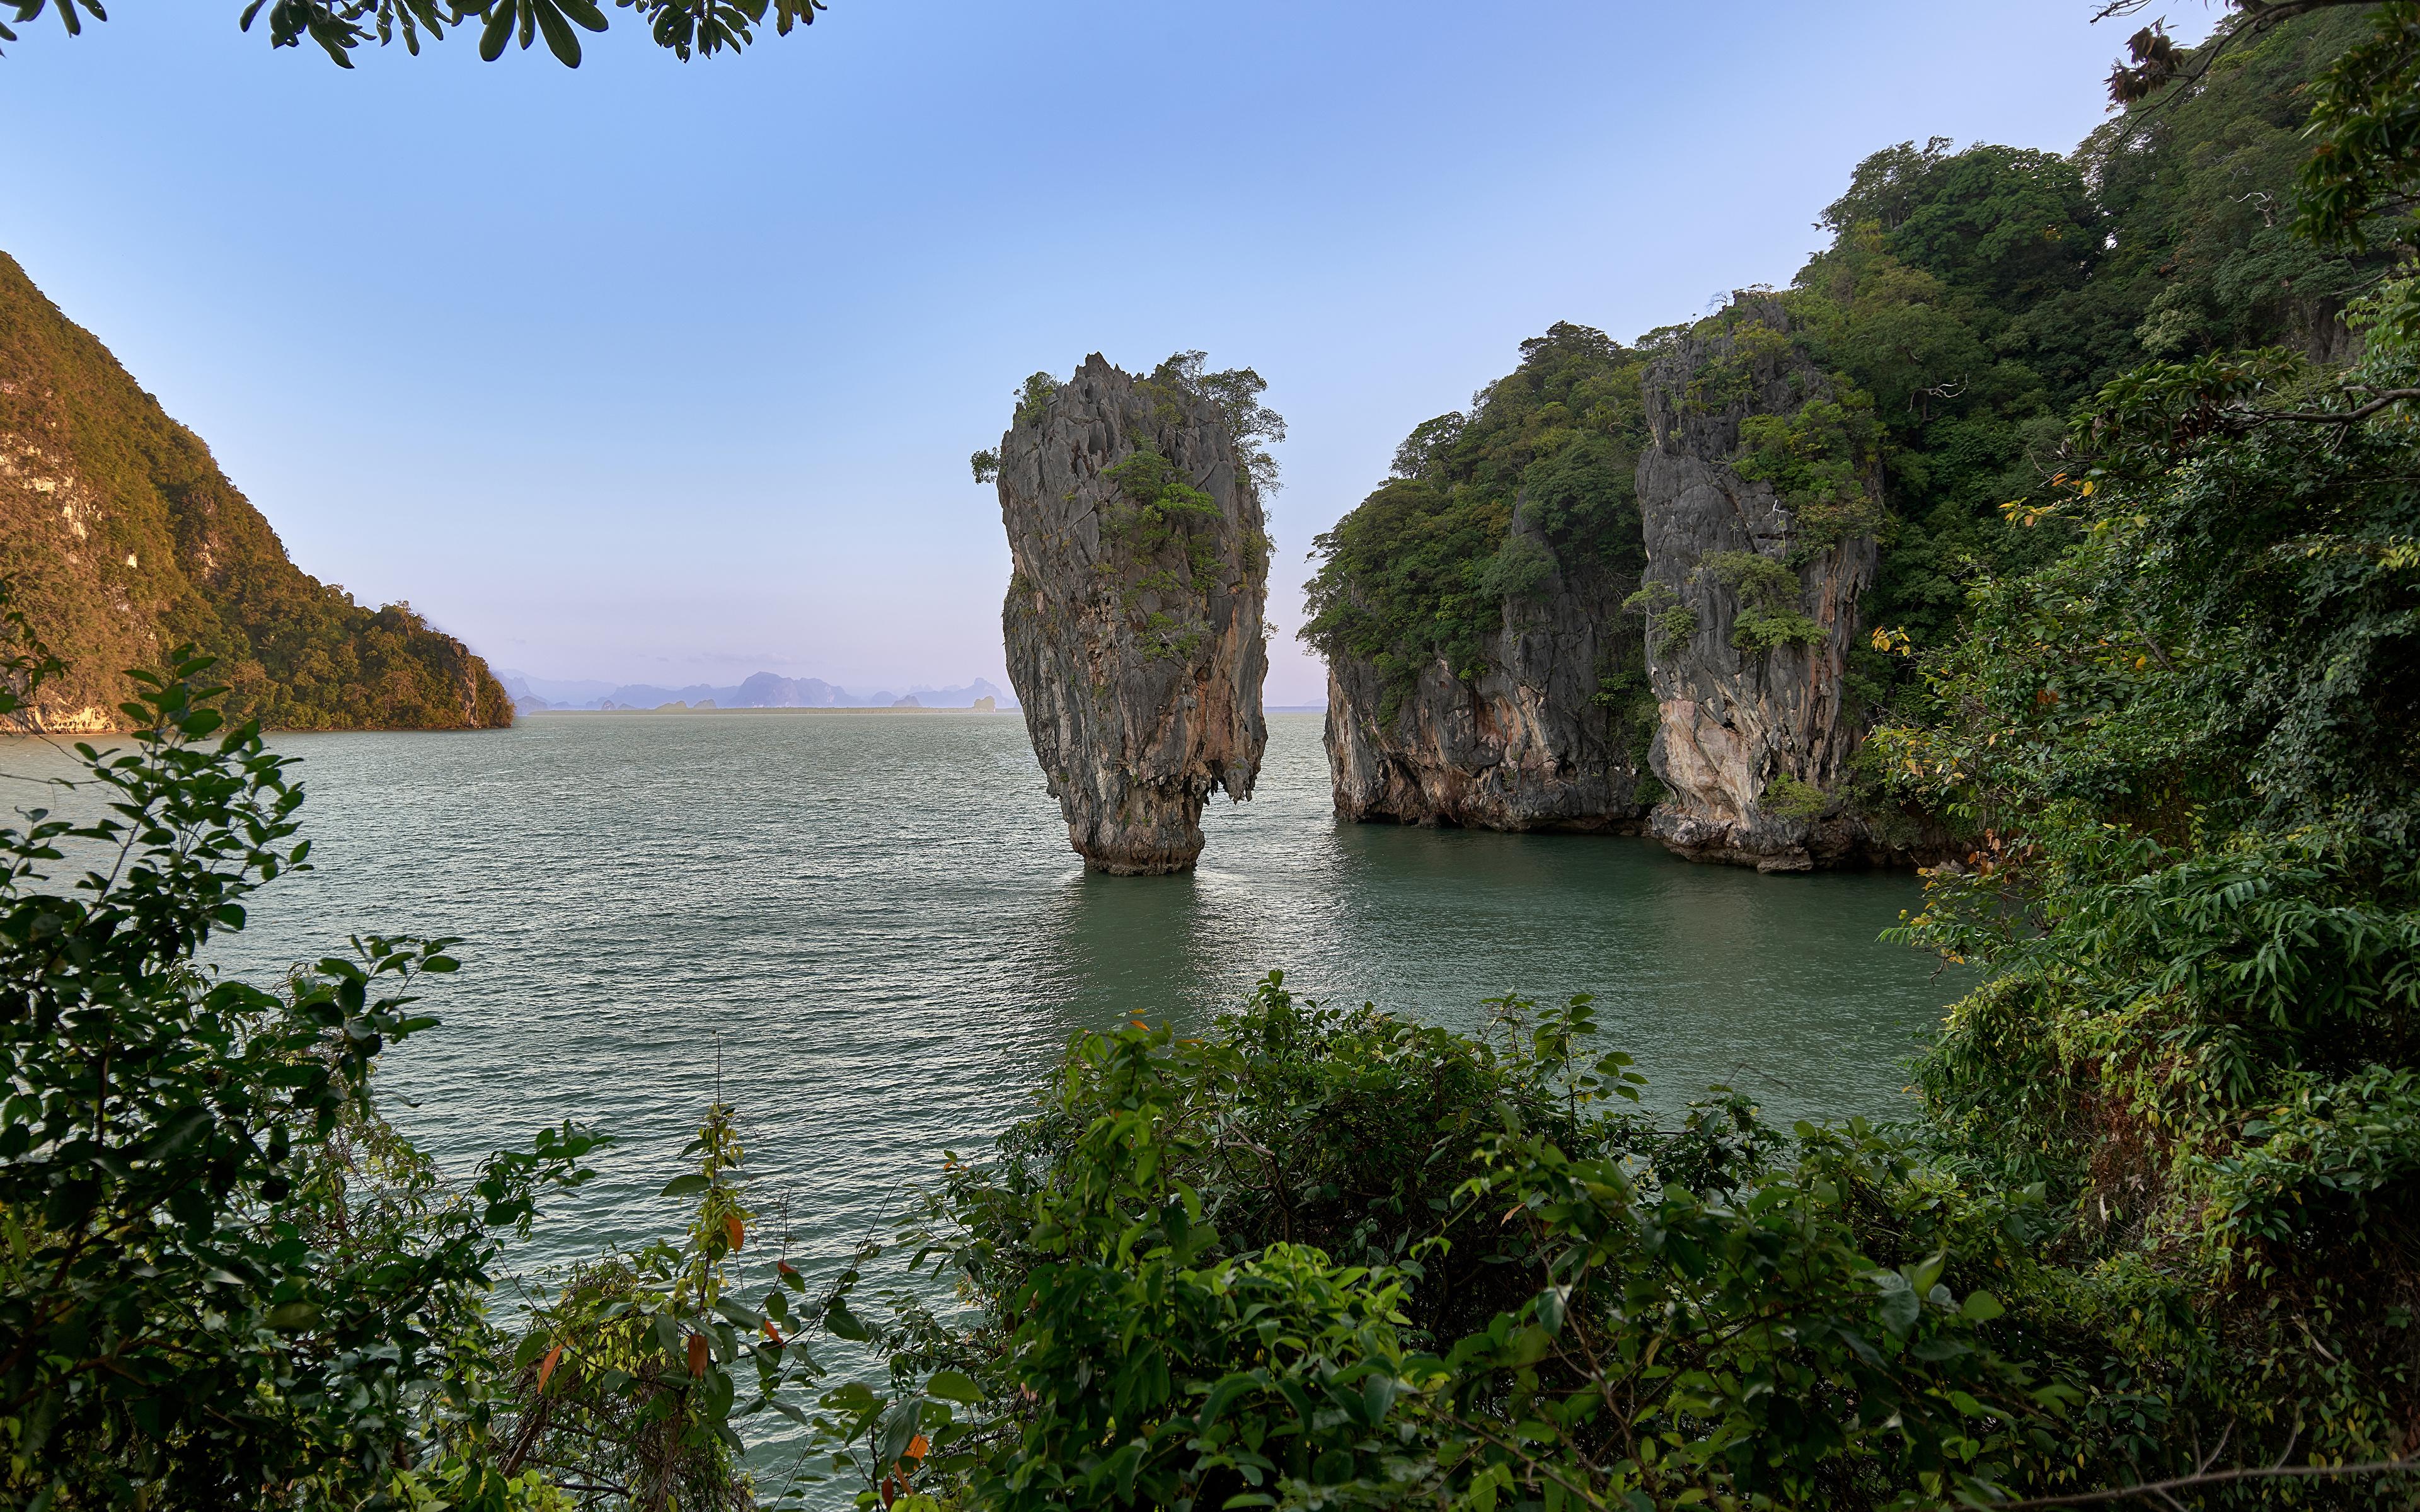 Фотография Таиланд Khao Phing Kan скале Природа Парки Залив 3840x2400 Утес Скала скалы парк залива заливы